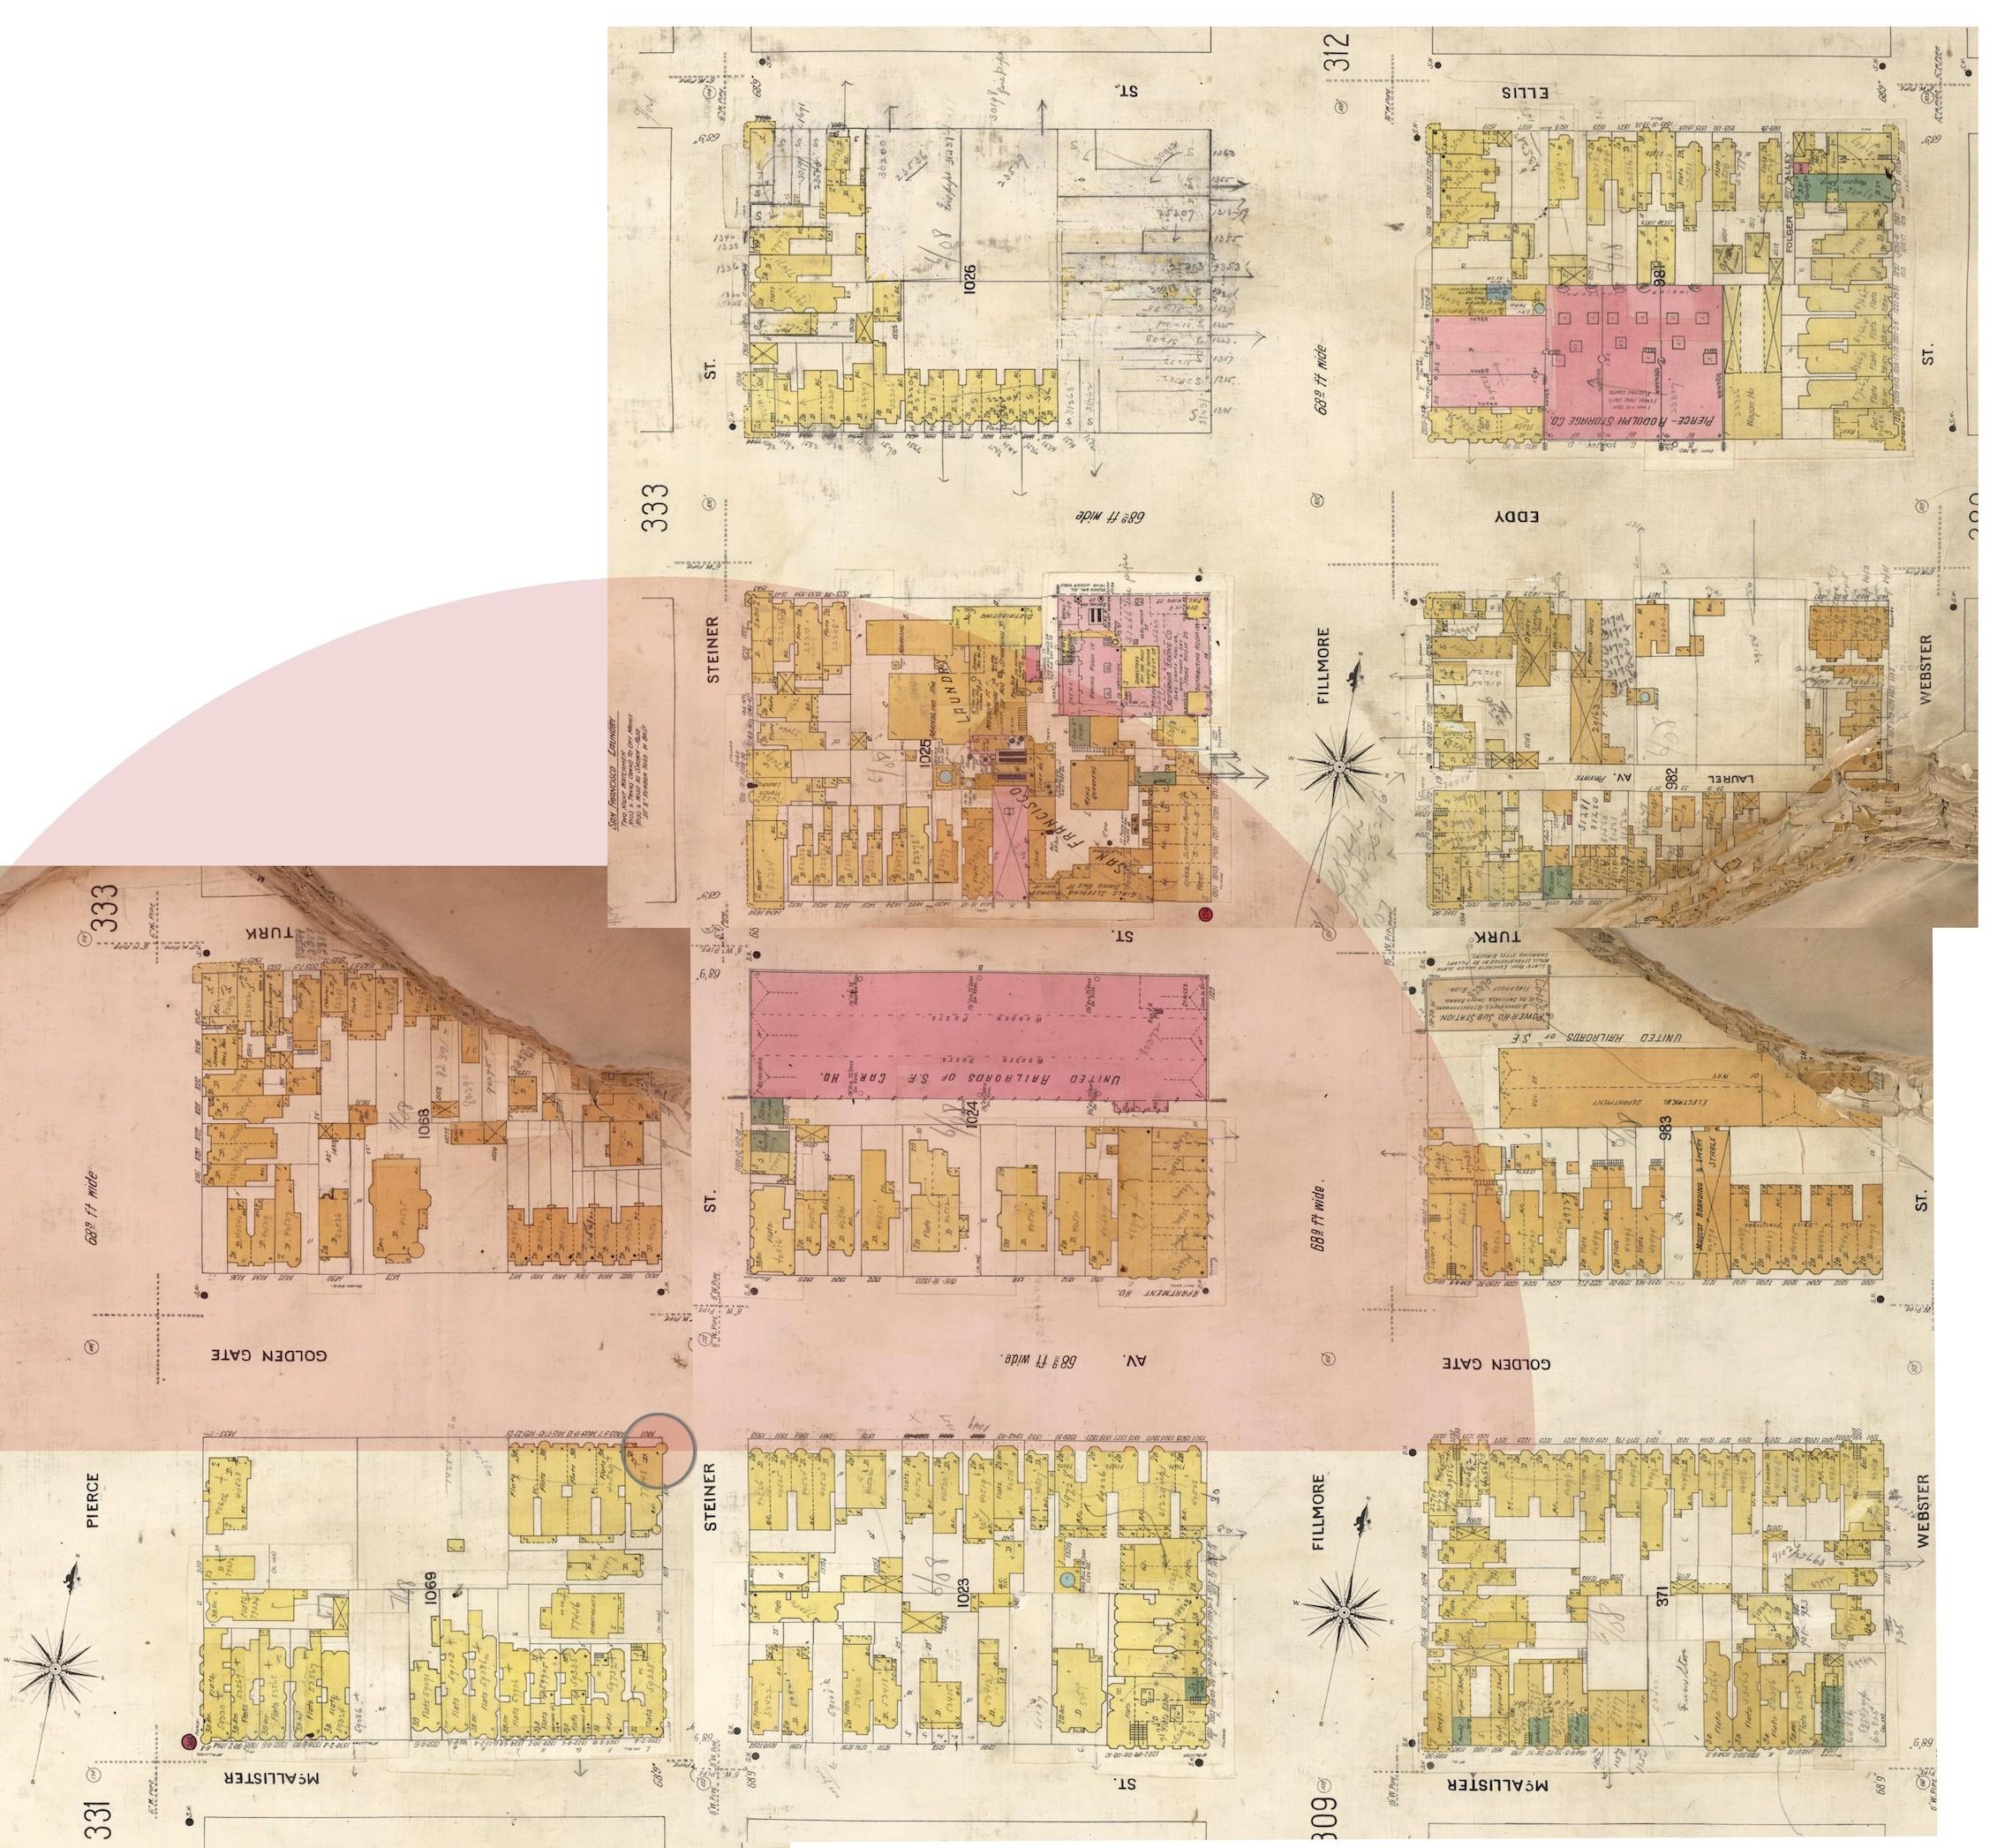 Hebbard & Gill, Architects | San Diego History Center